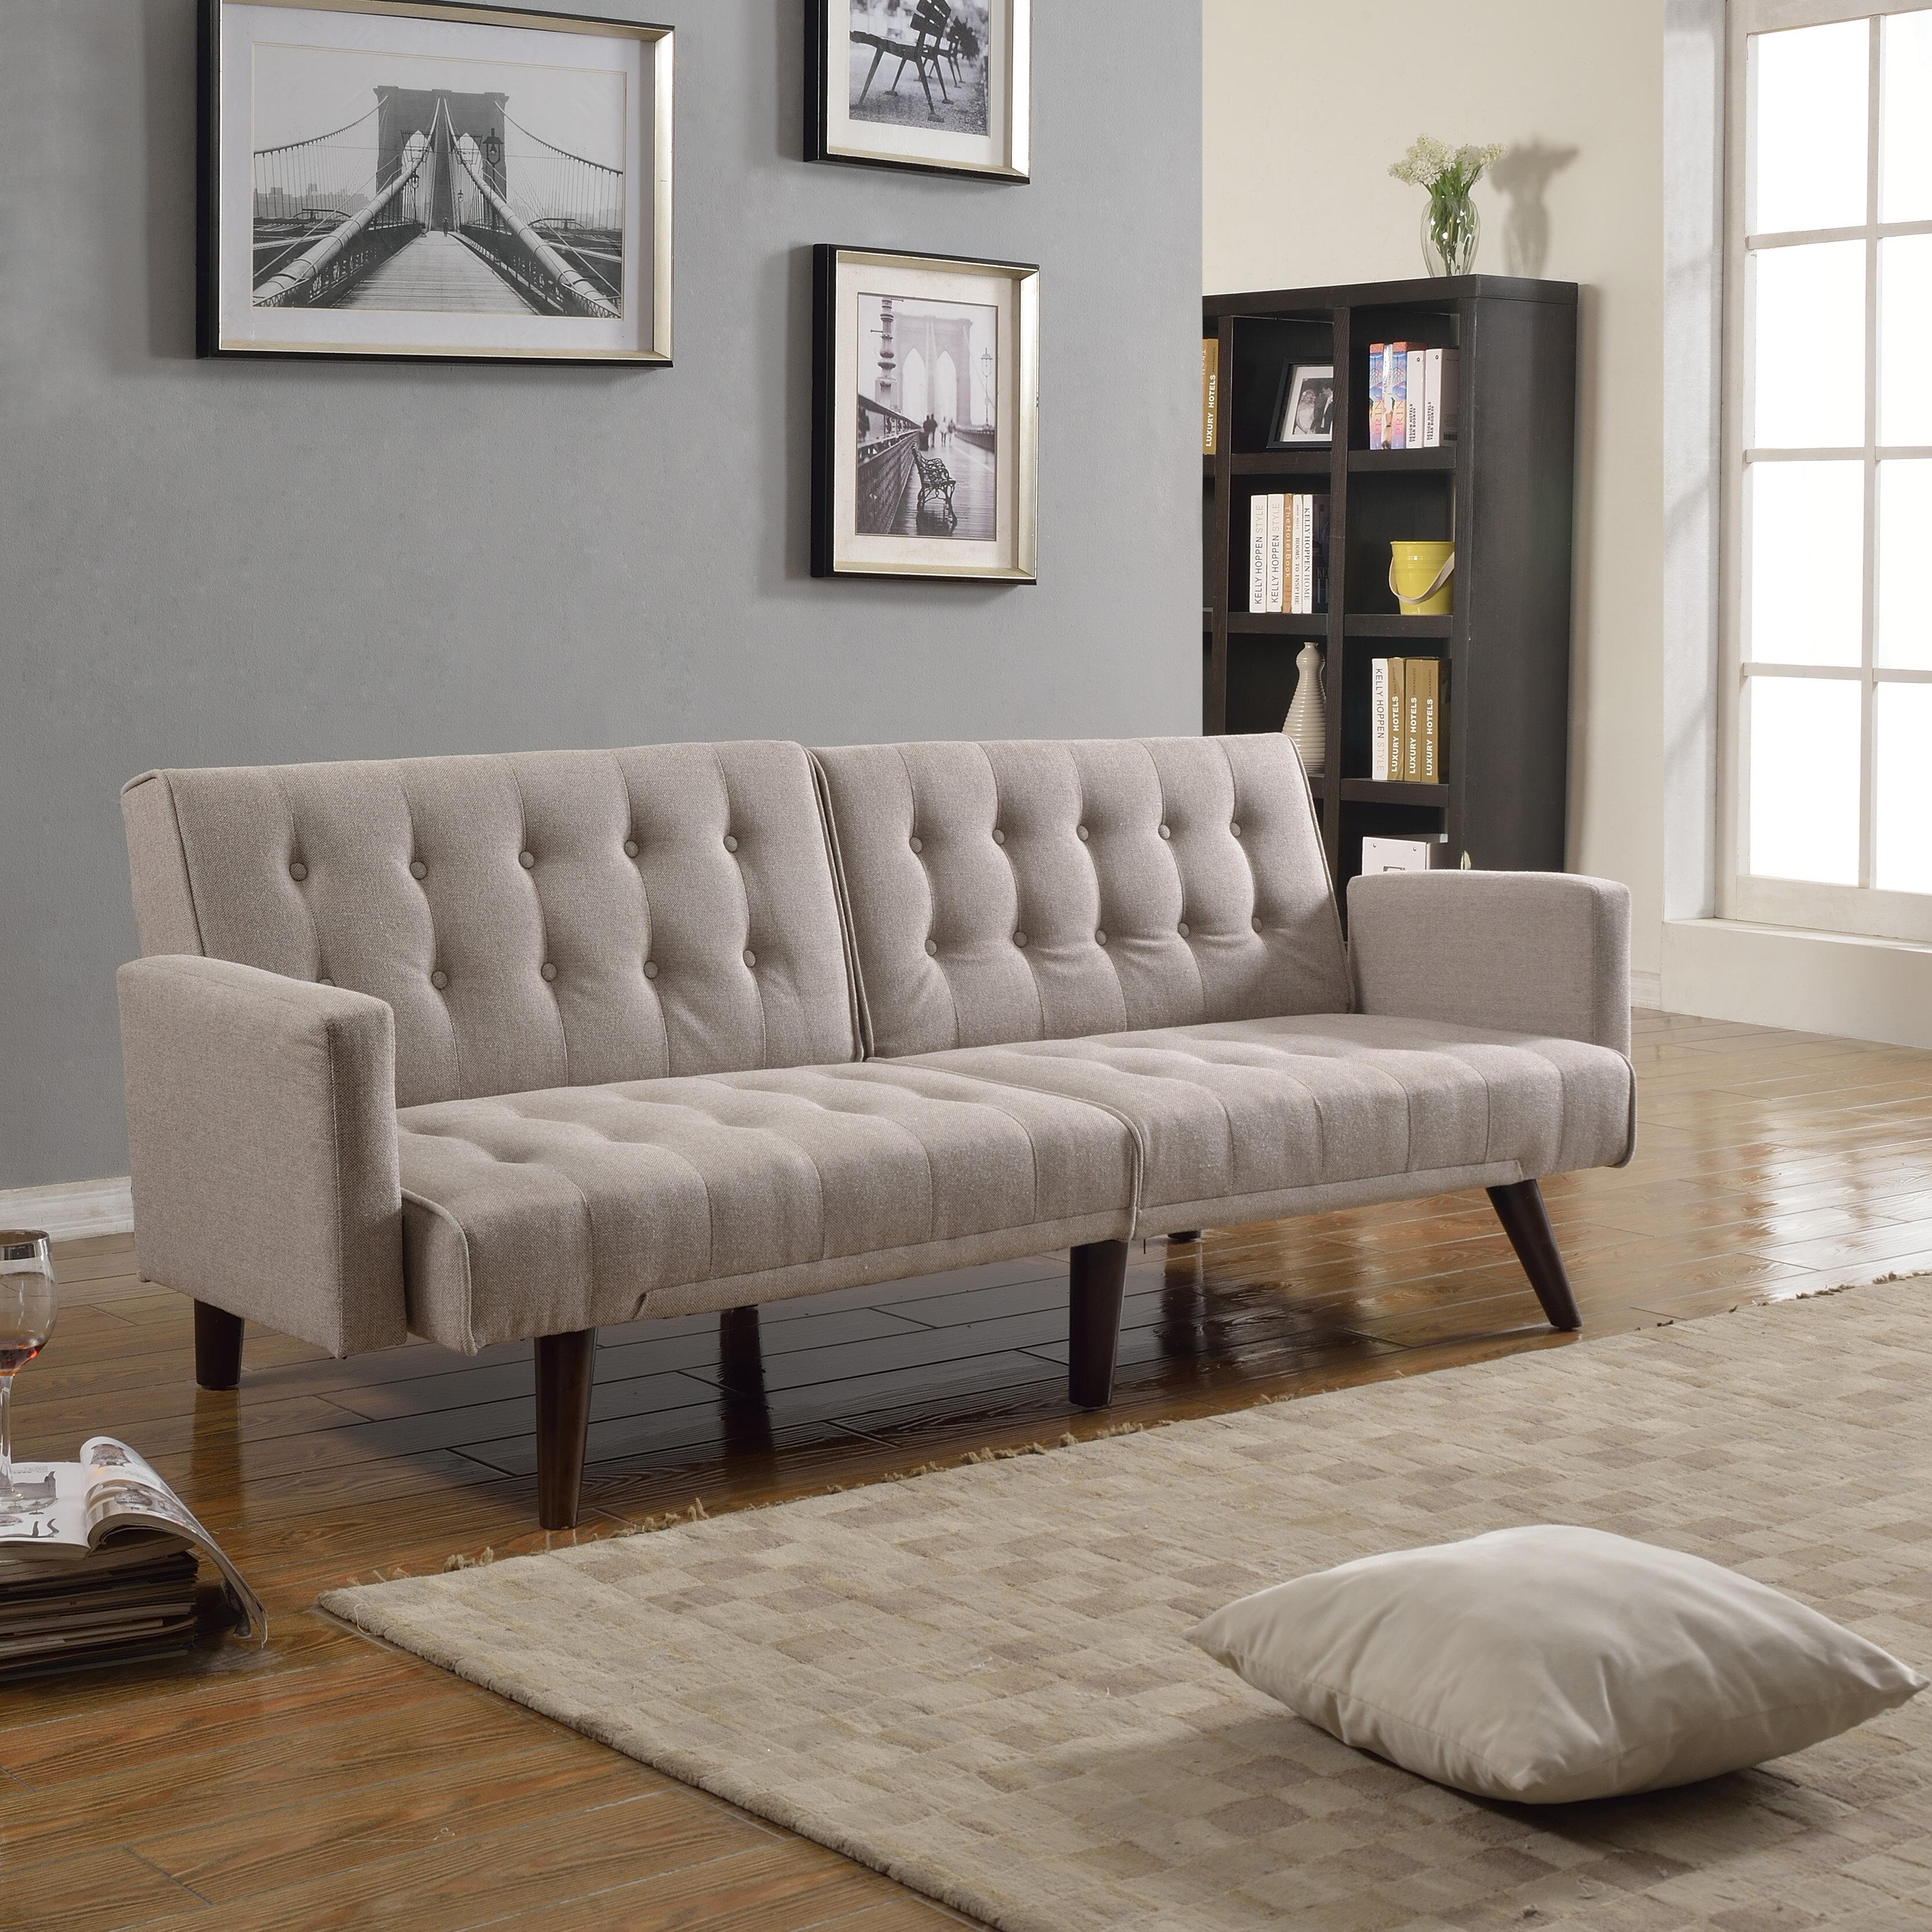 Langley Street Kaylynn Mid Century Convertible Sofa & Reviews | Wayfair